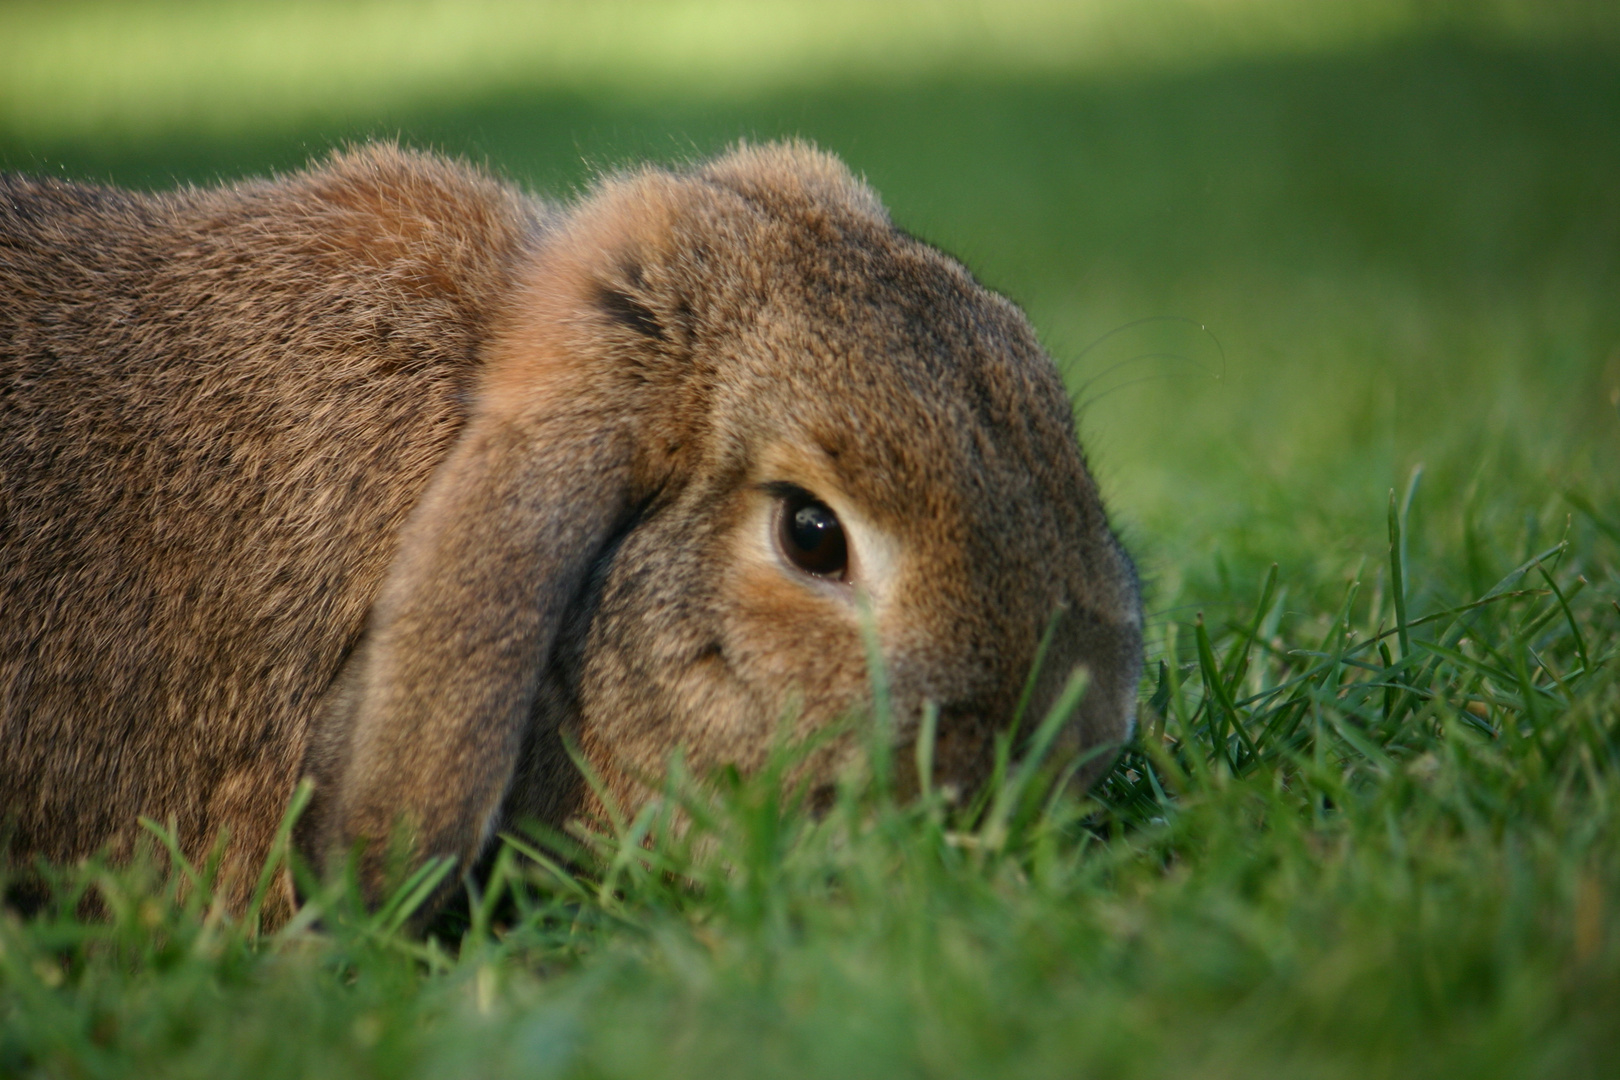 Benny-Bunny